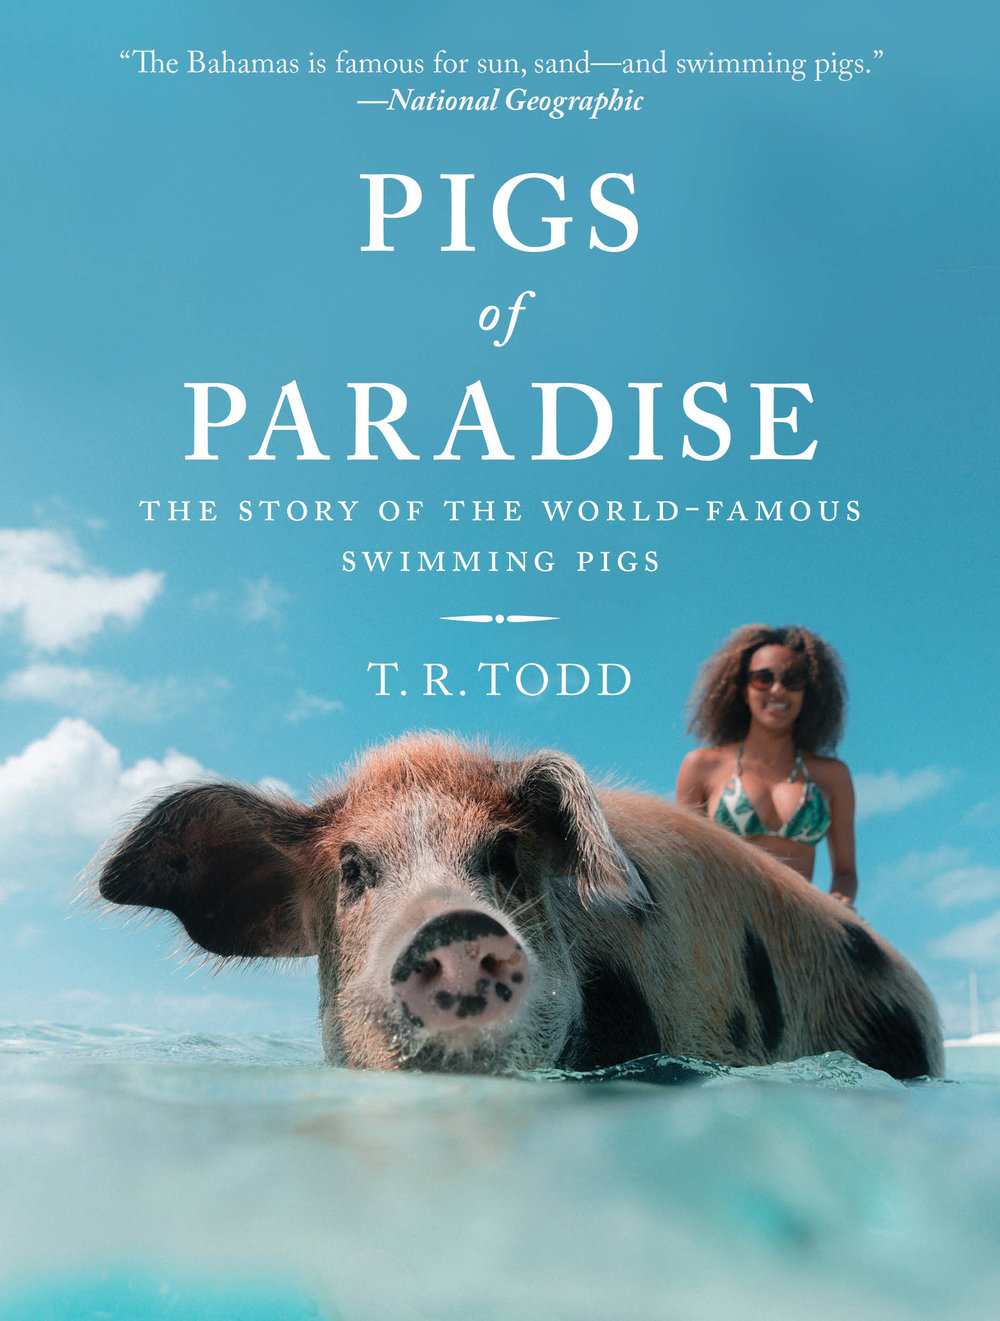 Pigs of Paradise.jpg